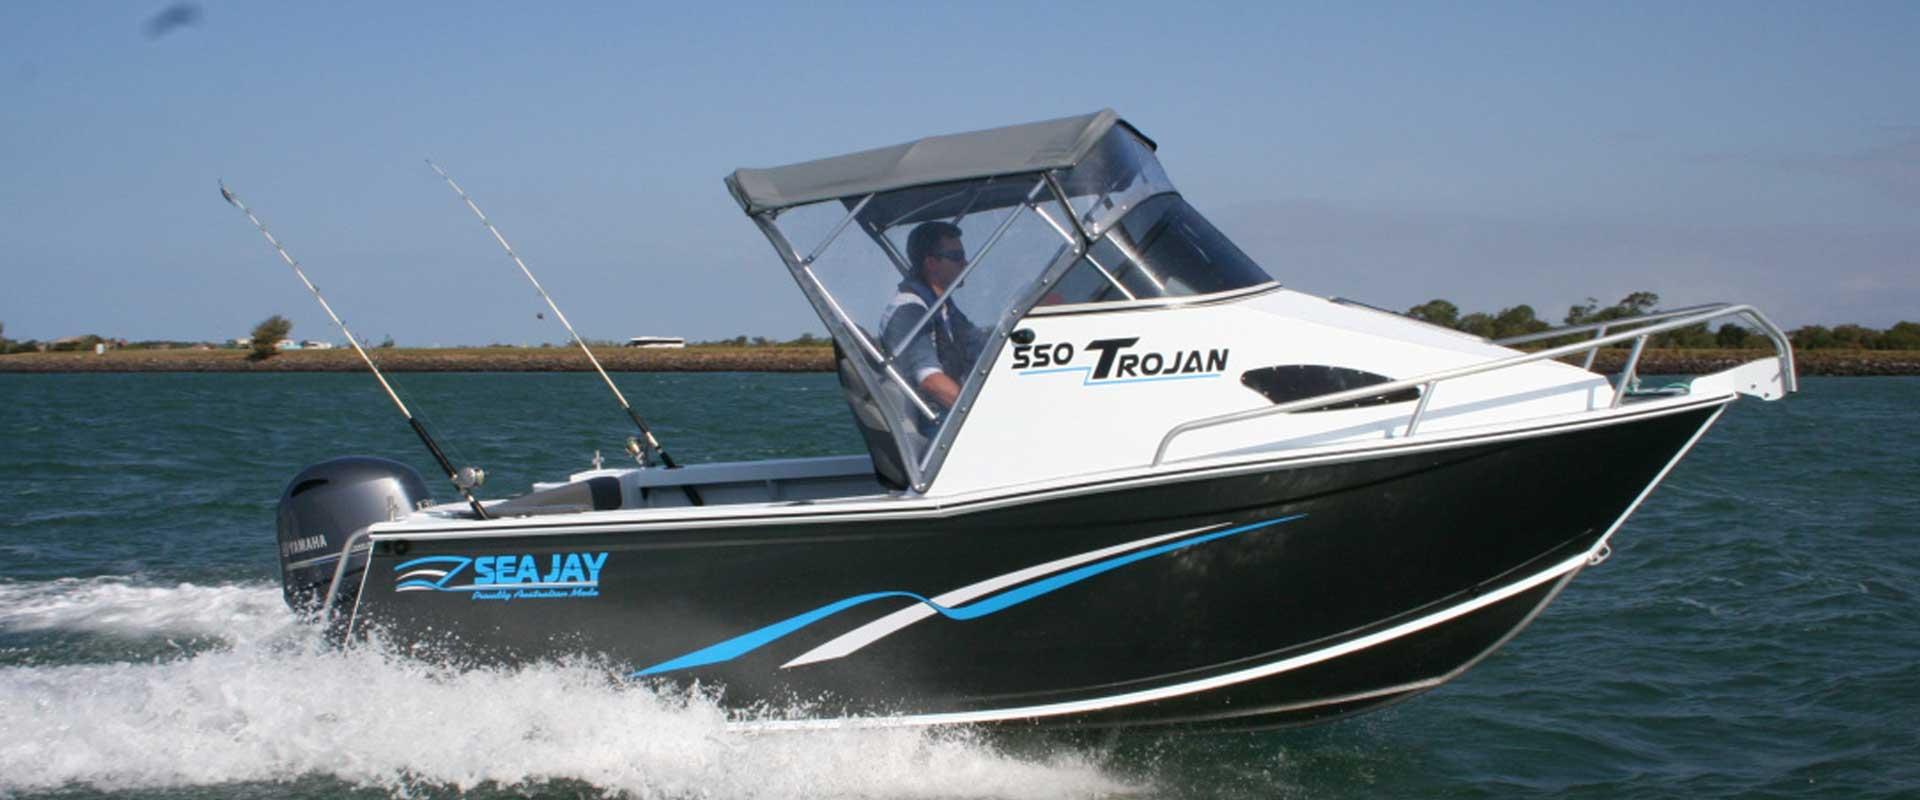 Sea Jay Trojan